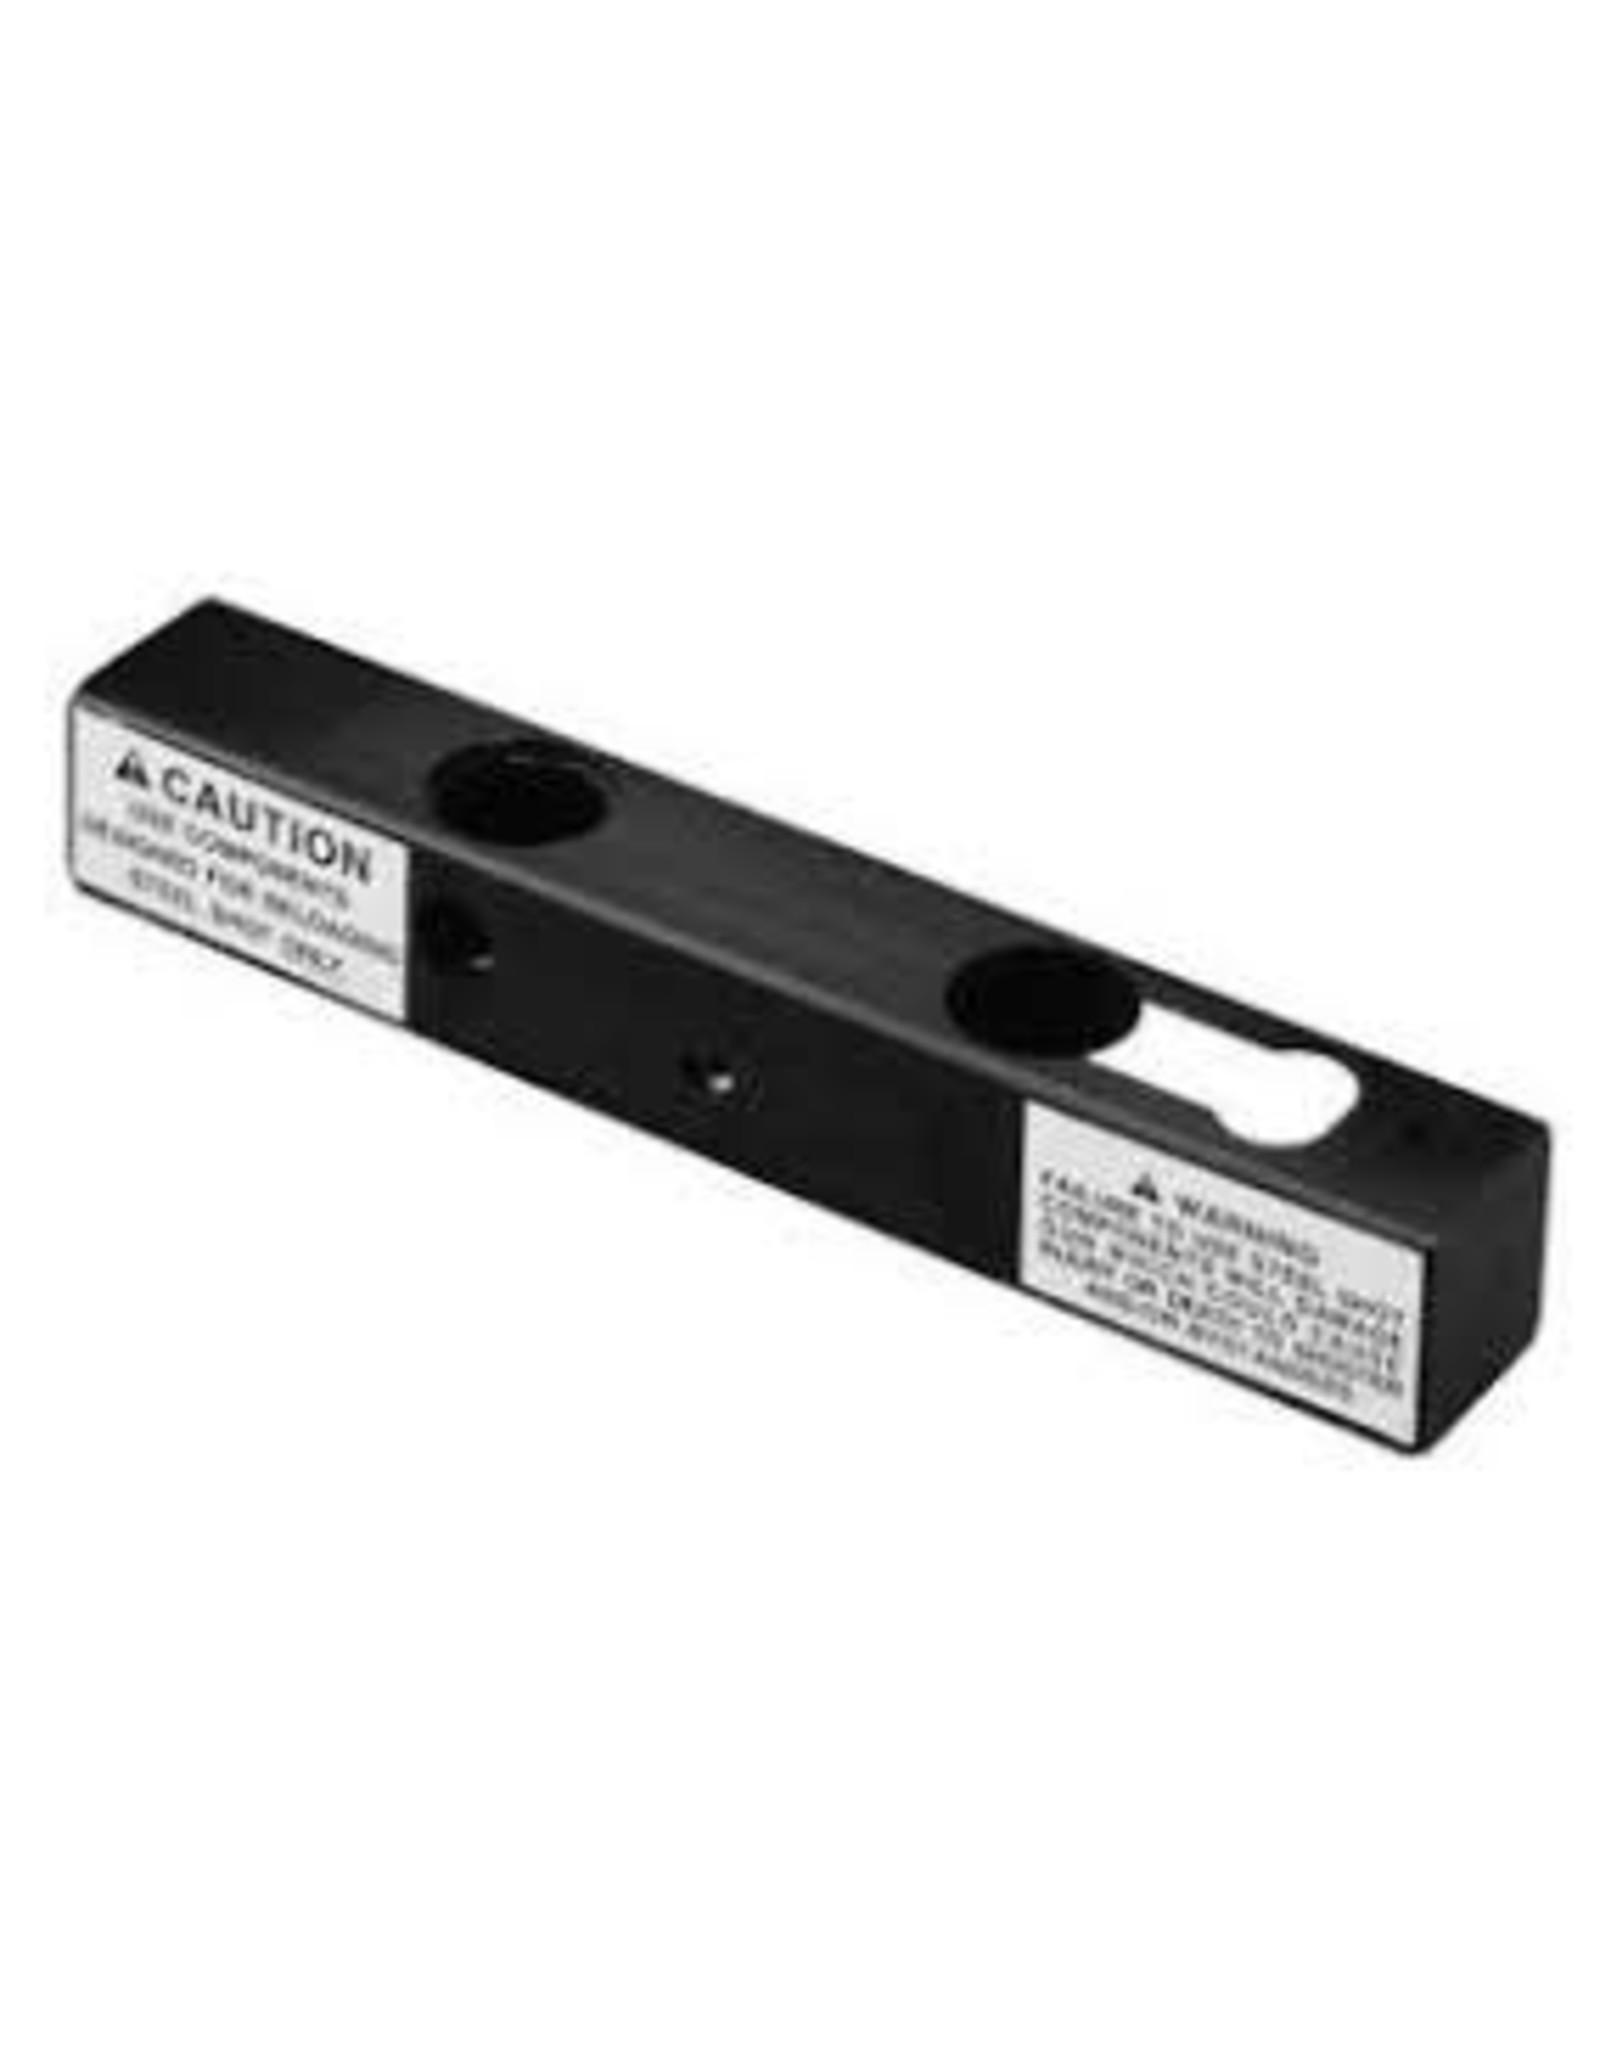 MEC MEC Steel Shot 502 Charge Bar 1 3/16 Oz